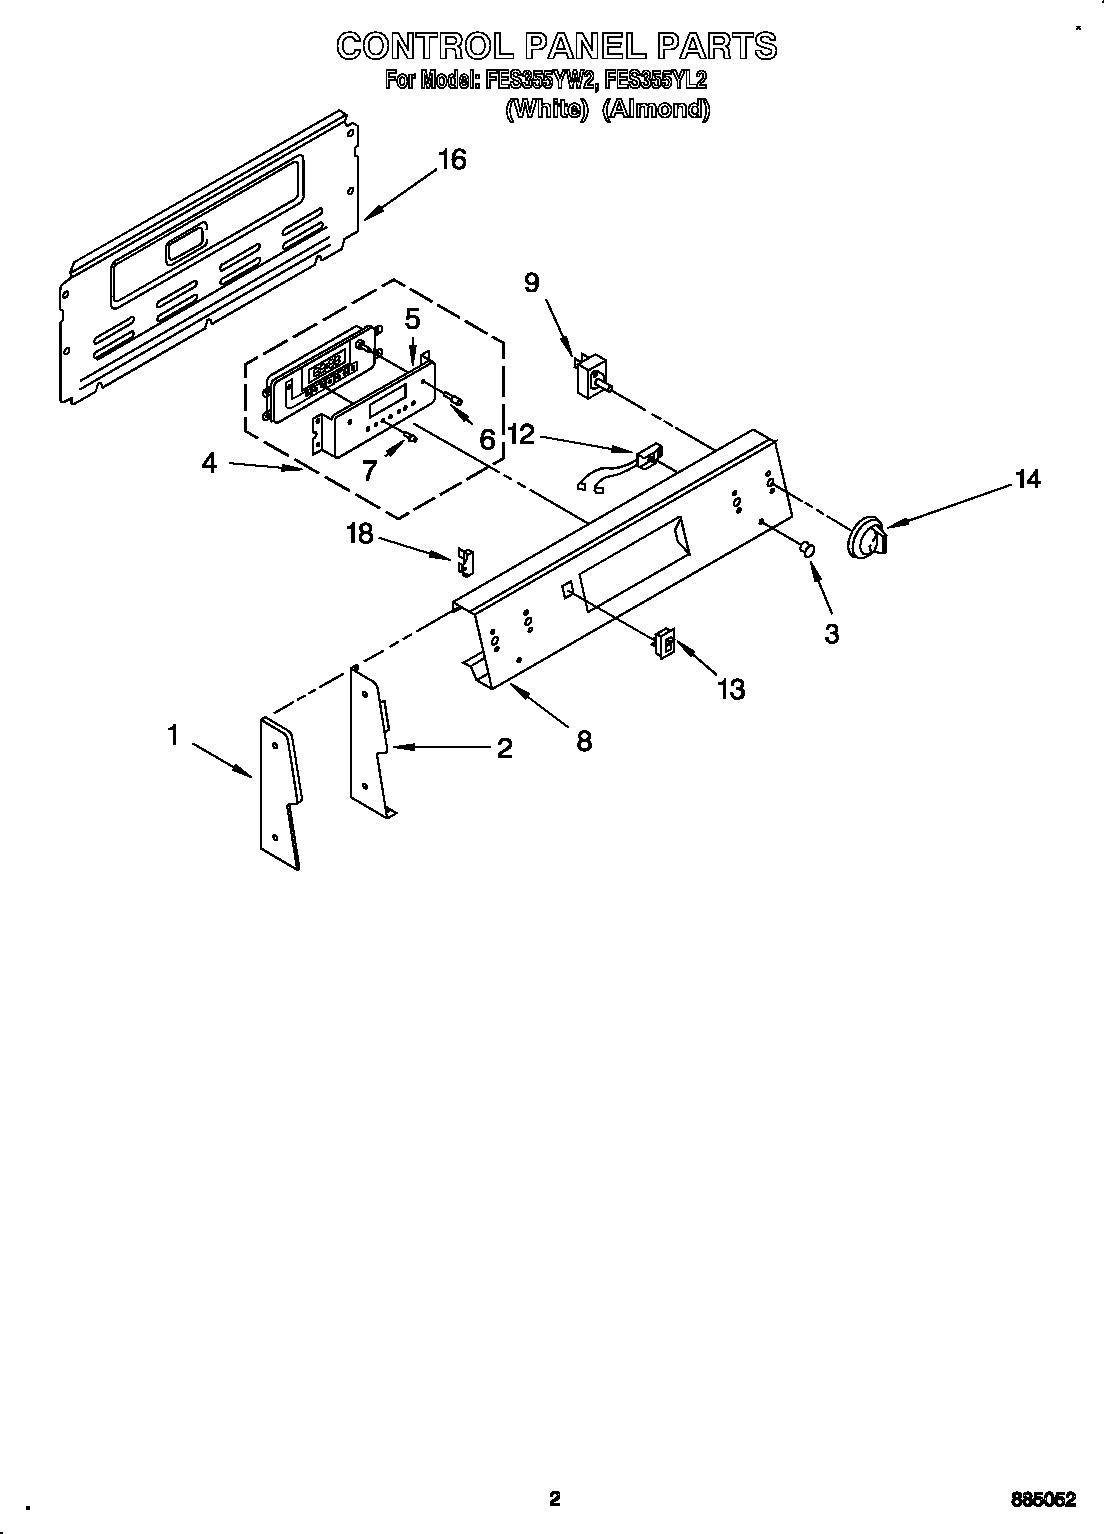 roper electric range unit parts model fes355yw2 searspartsdirect